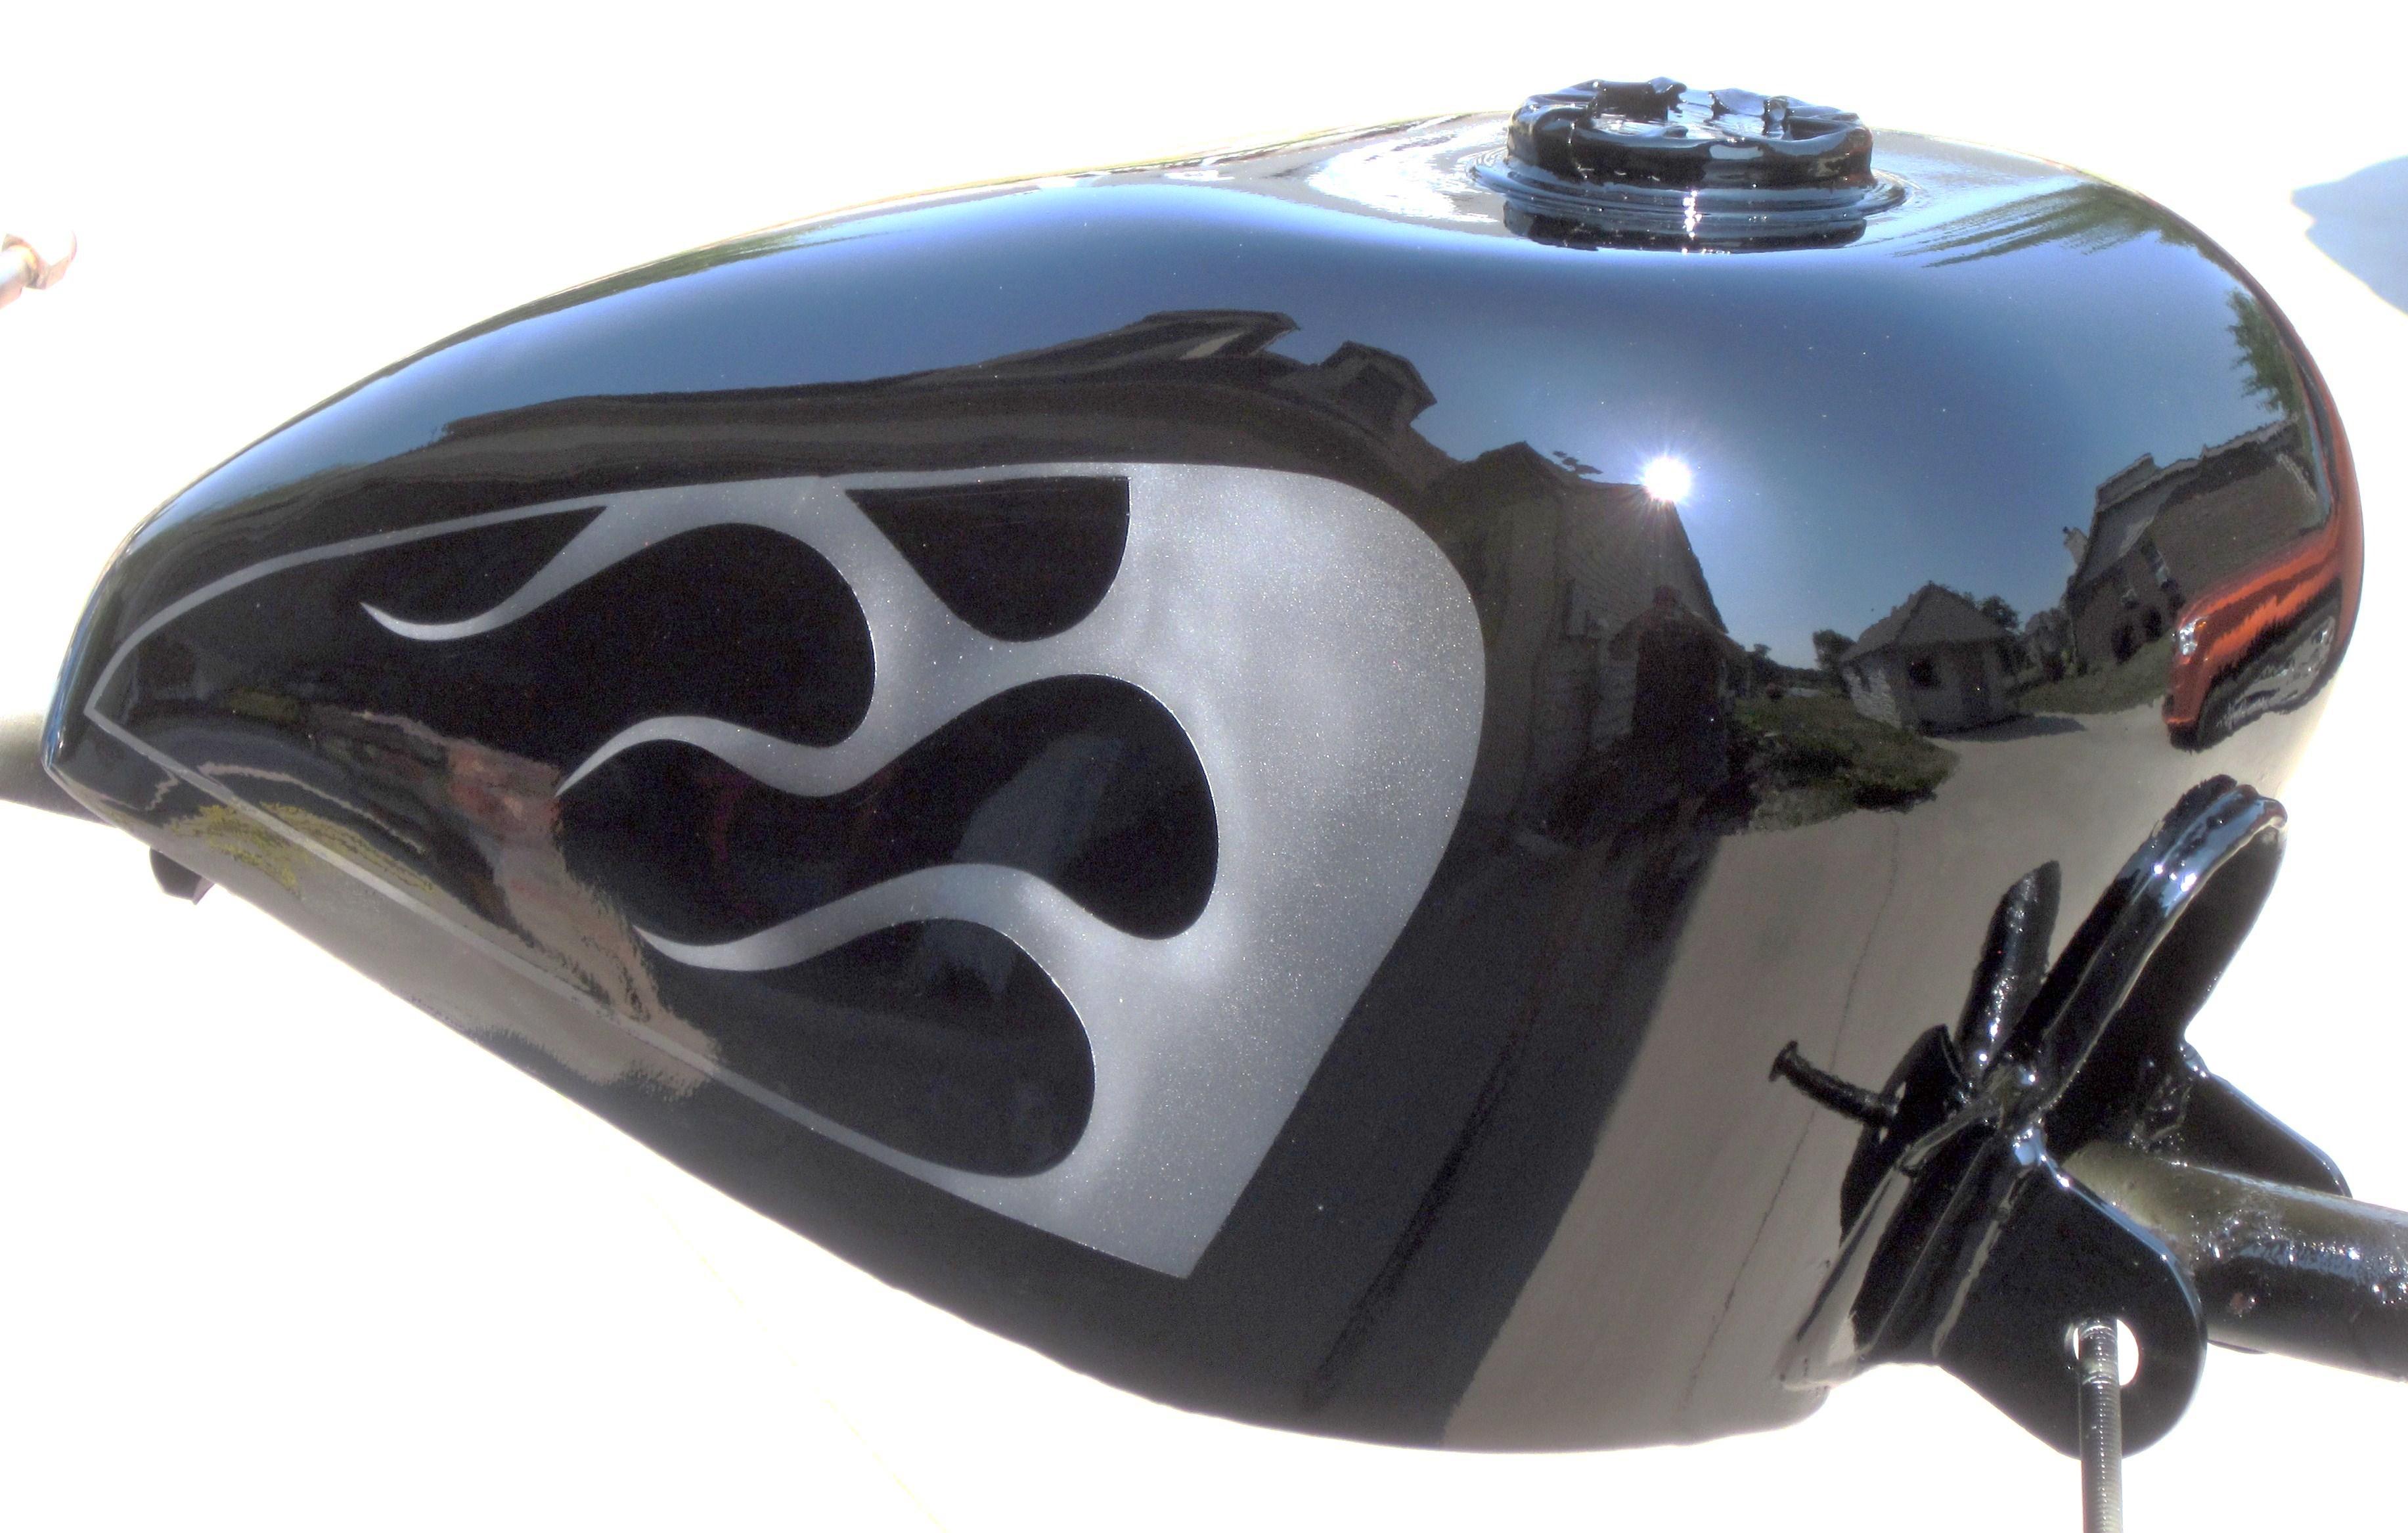 Click image for larger version  Name:bike, tank, paint gun 015.JPG Views:97 Size:1.05 MB ID:67149